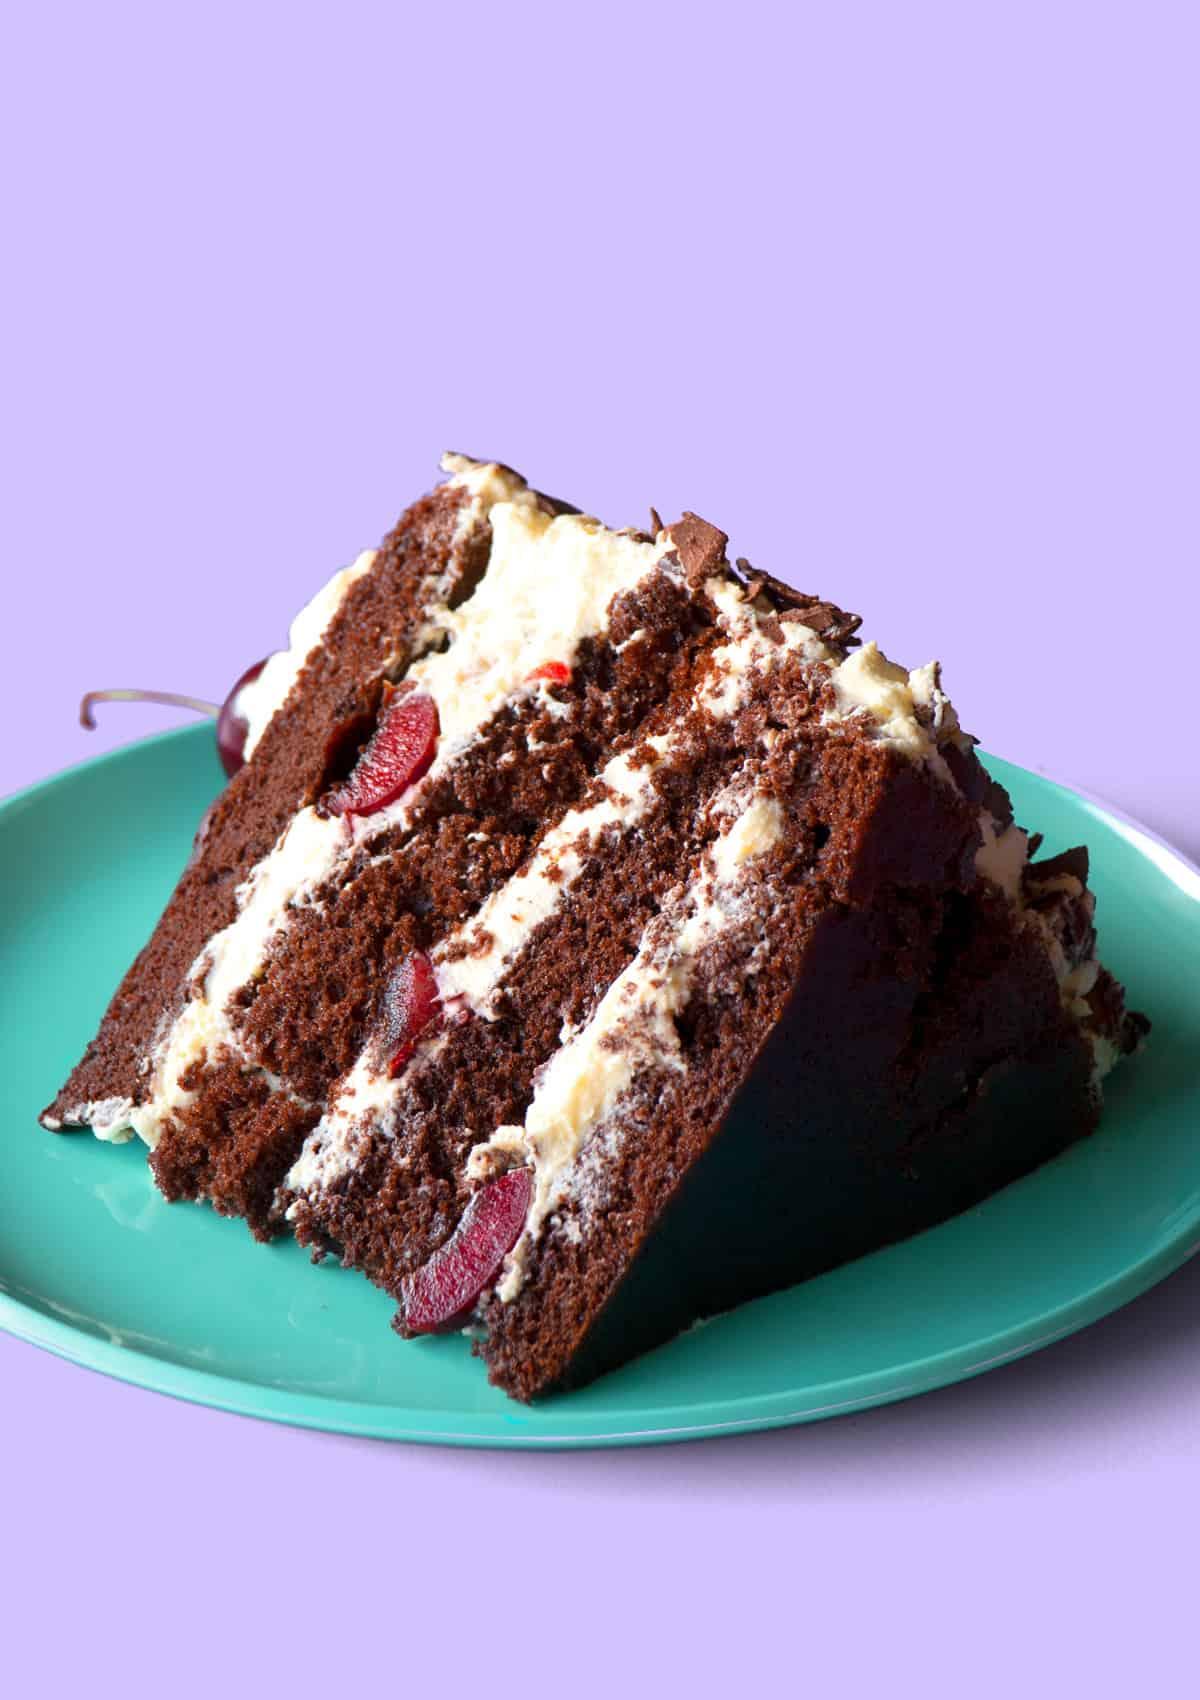 Wide Shot of a slice of black forest cake